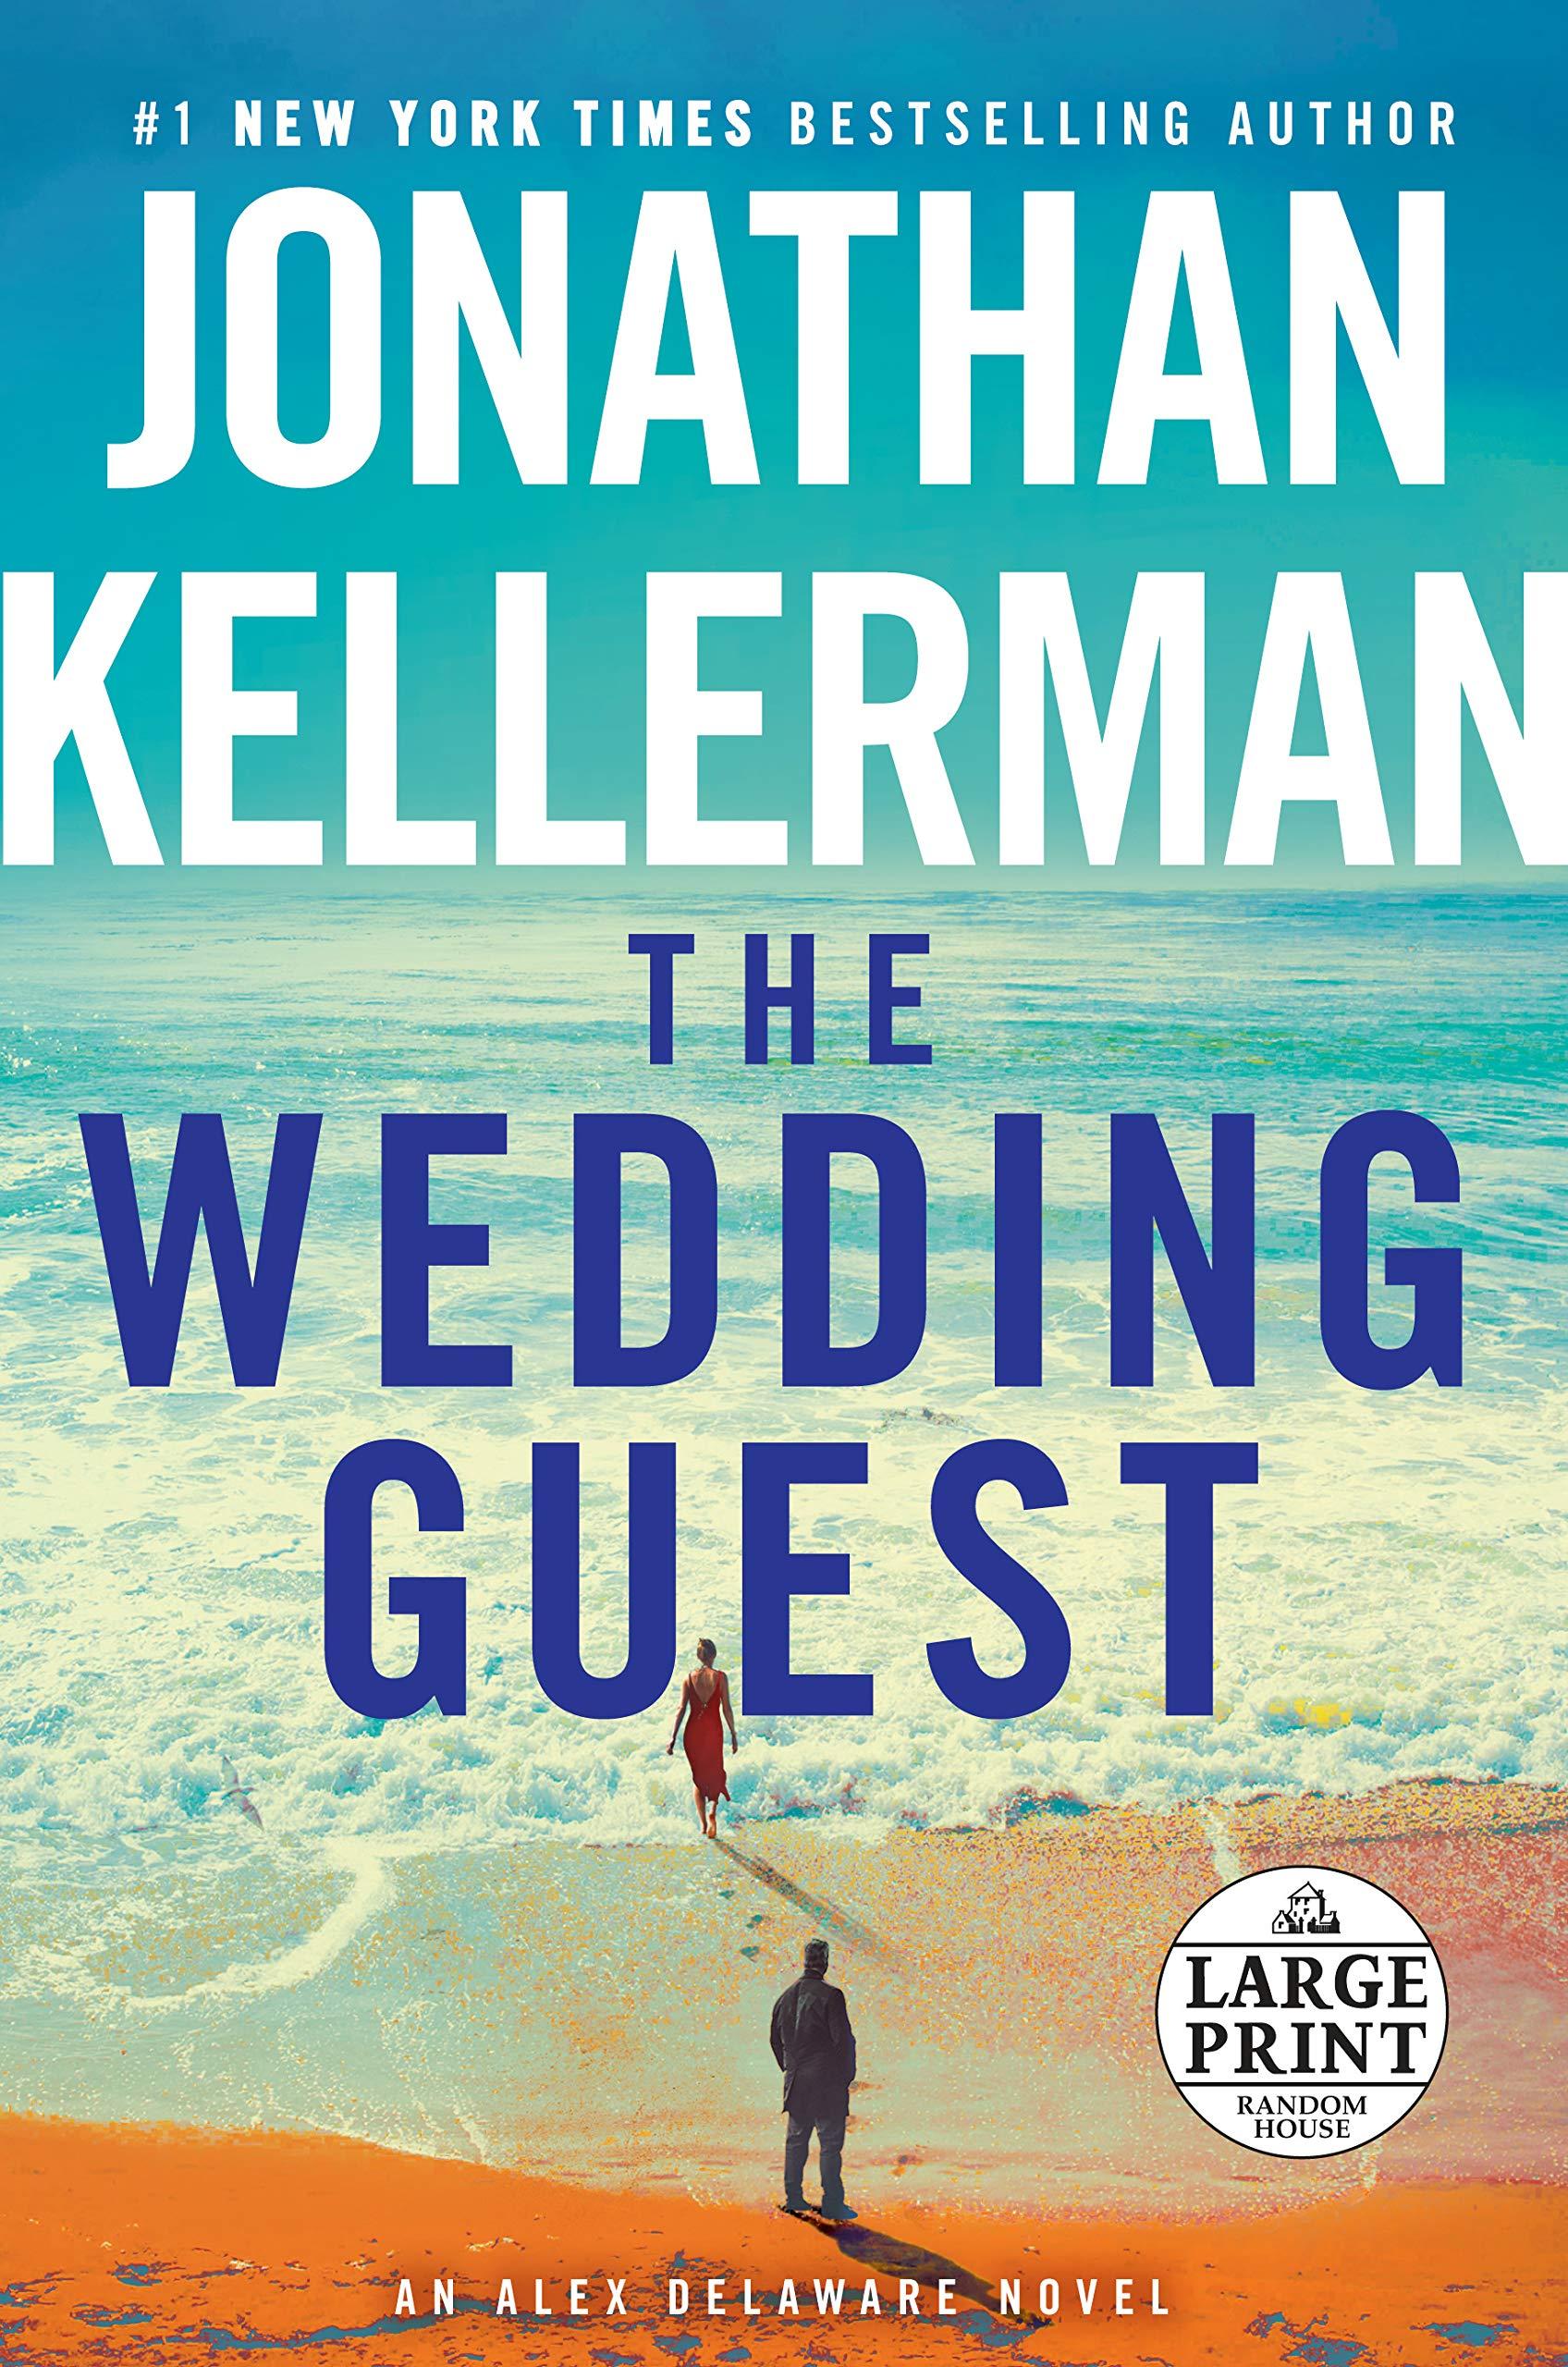 6ae74b10138 Amazon.com  The Wedding Guest  An Alex Delaware Novel (9781984885005 ...